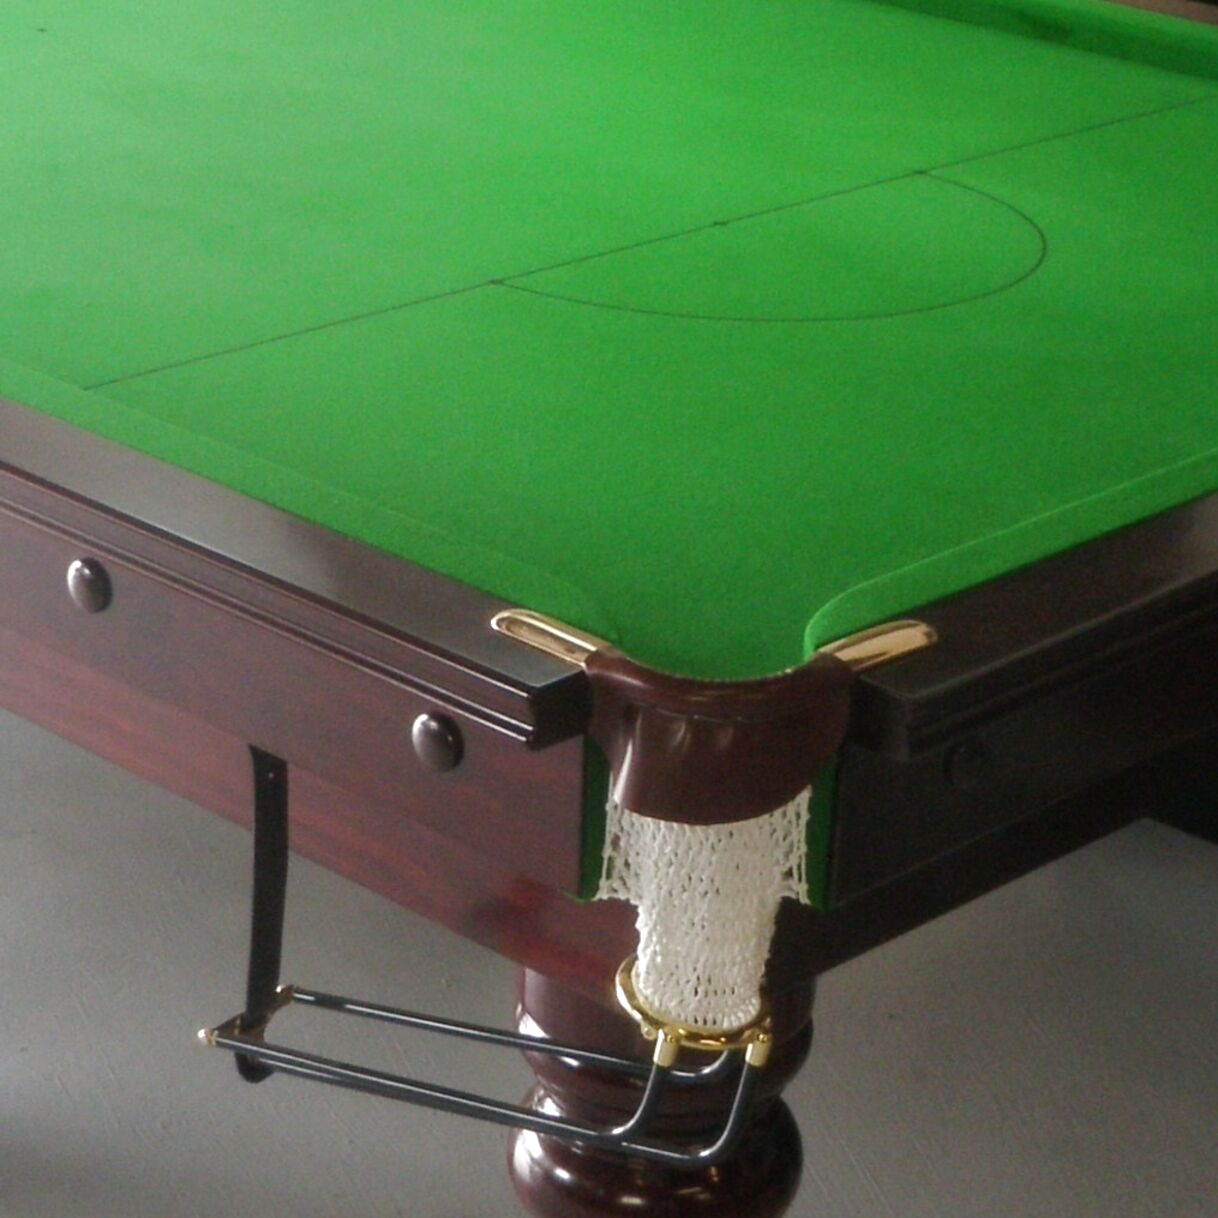 6Pcs//Set Billiard Pool Table Cotton Mesh Net Bags Pockets Accessory White 1